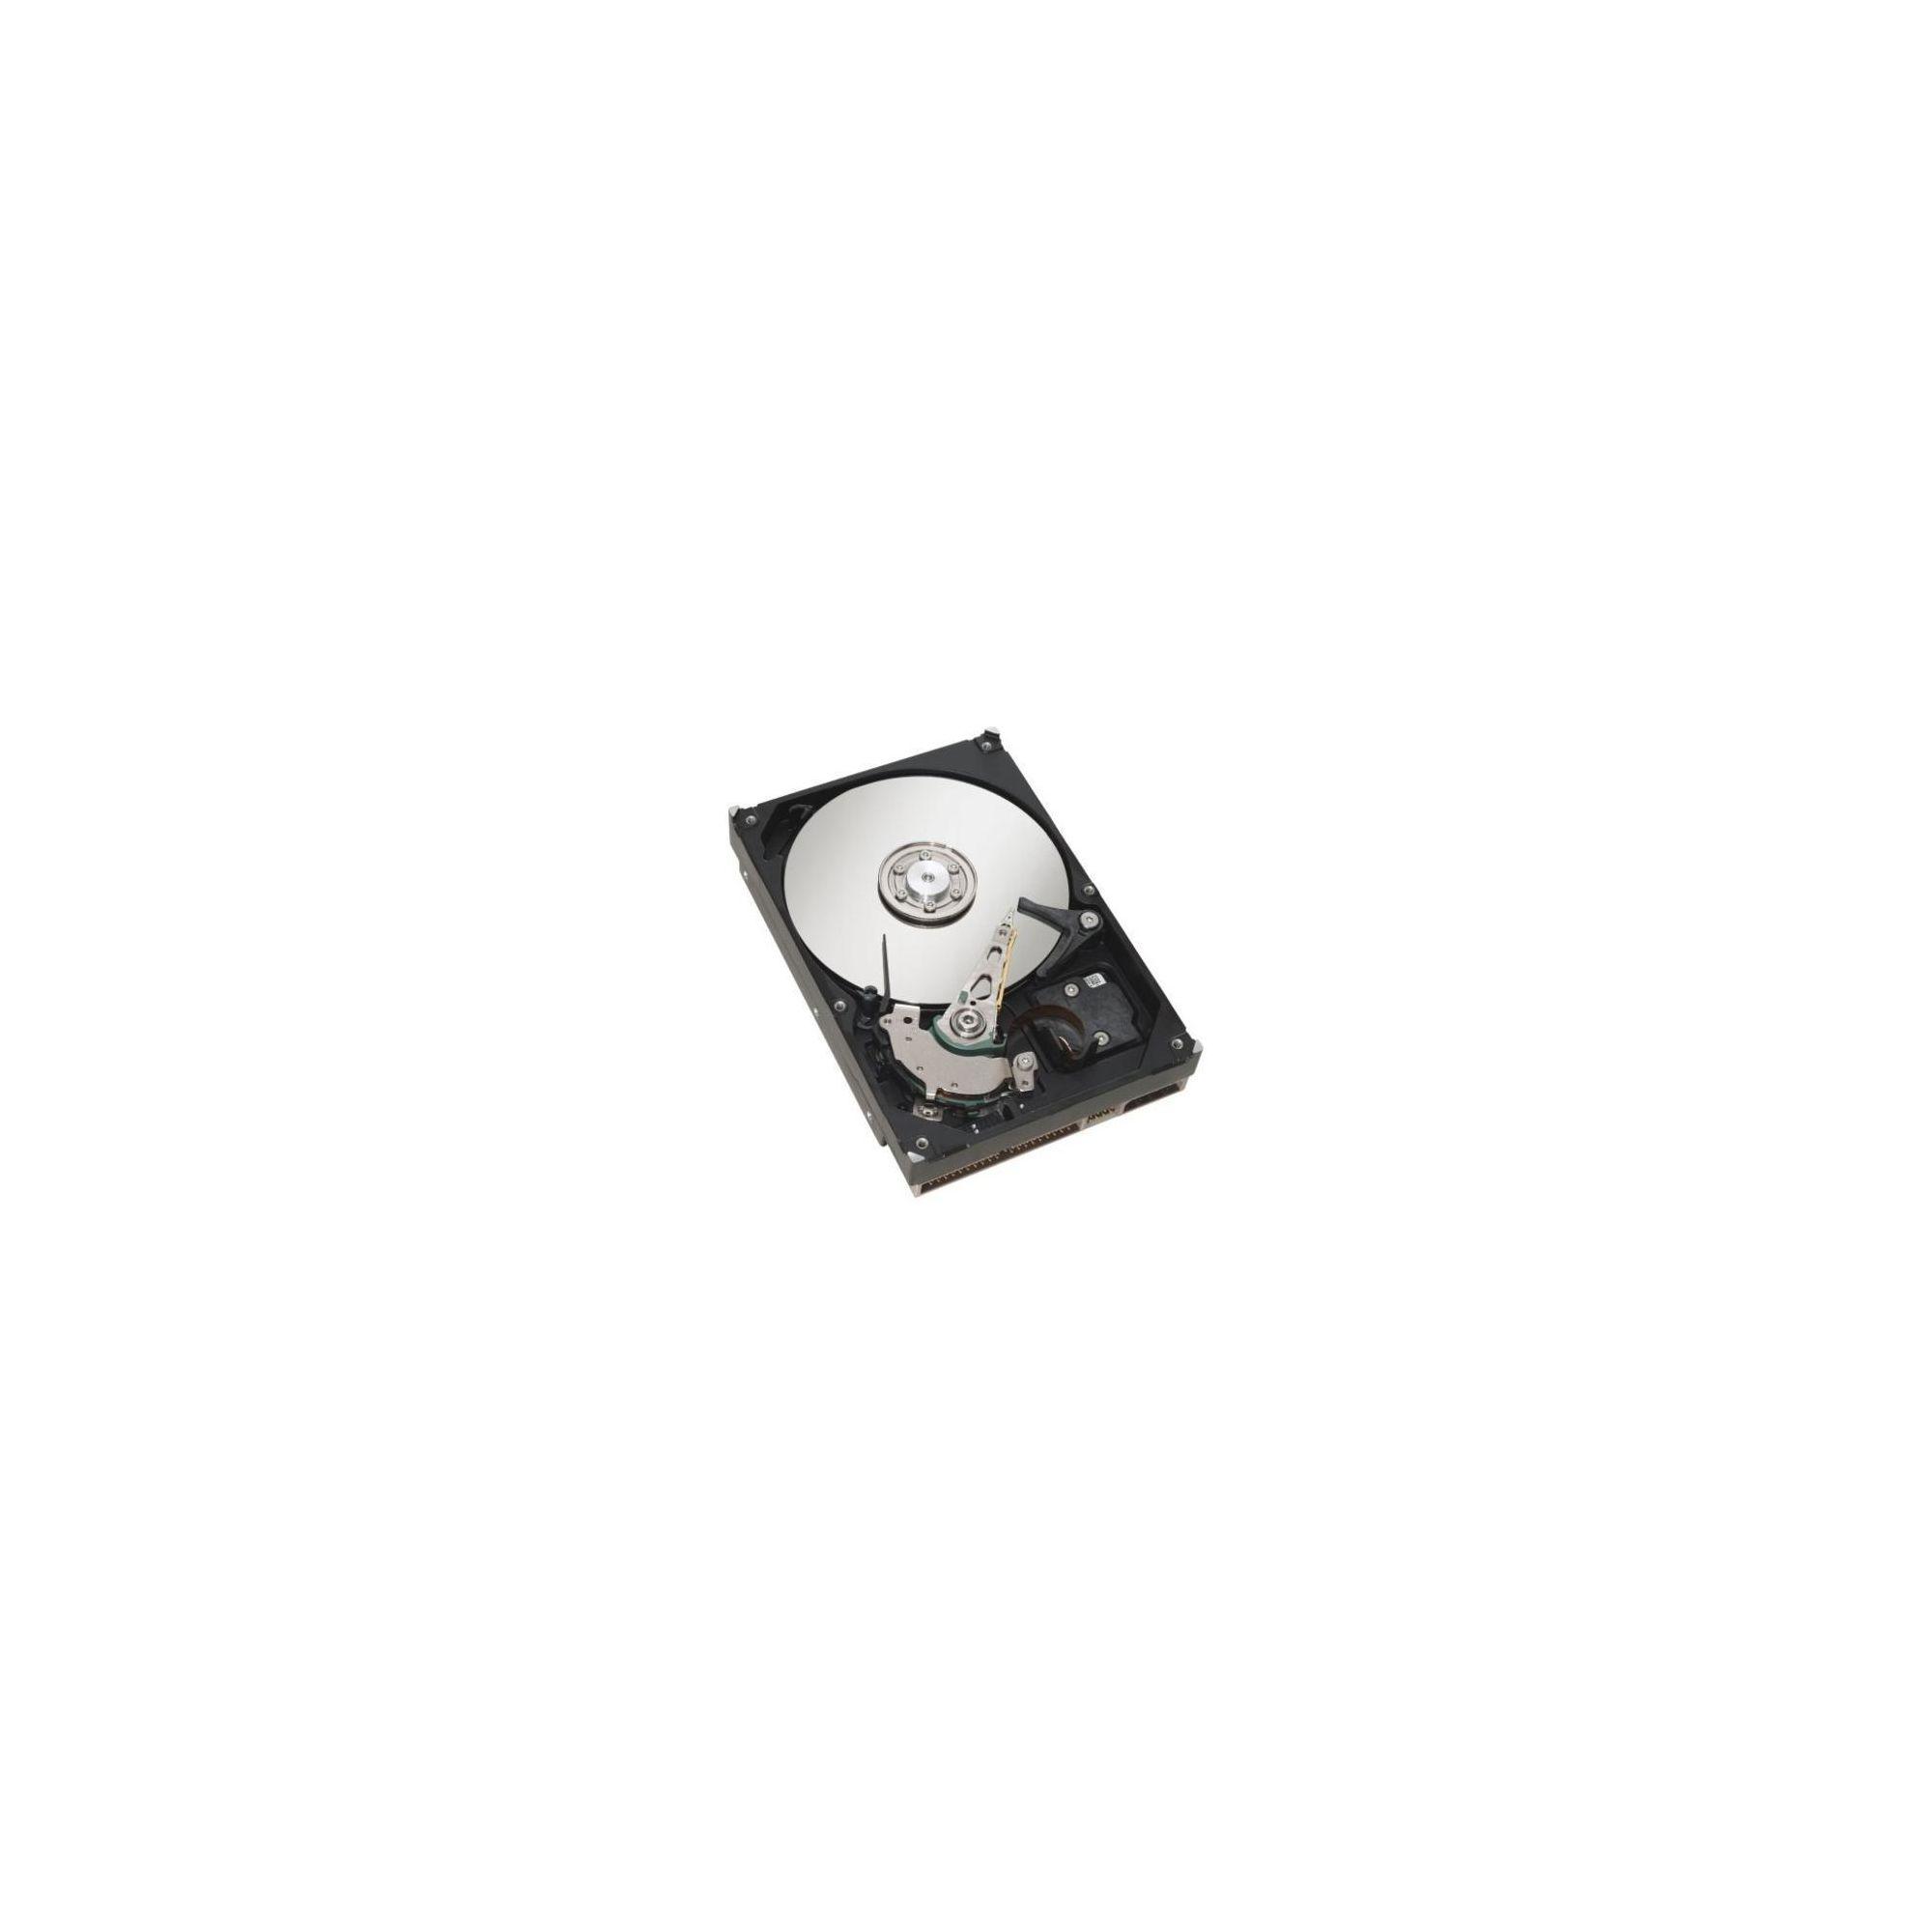 Fujitsu HD SAS 6G 300GB Internal Hard Drive at Tesco Direct